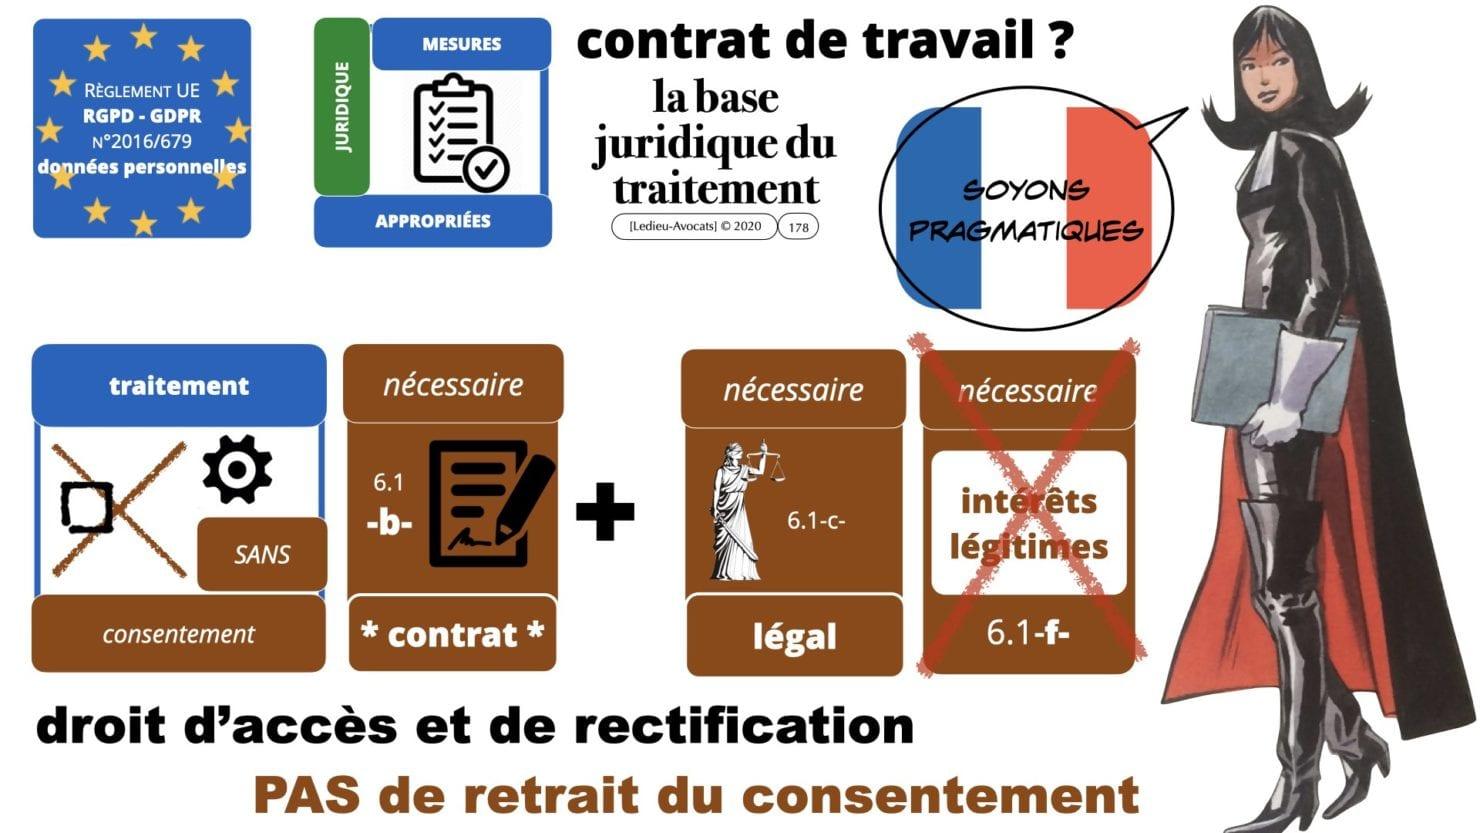 RGPD e-Privacy principes actualité jurisprudence ©Ledieu-Avocats 25-06-2021.178